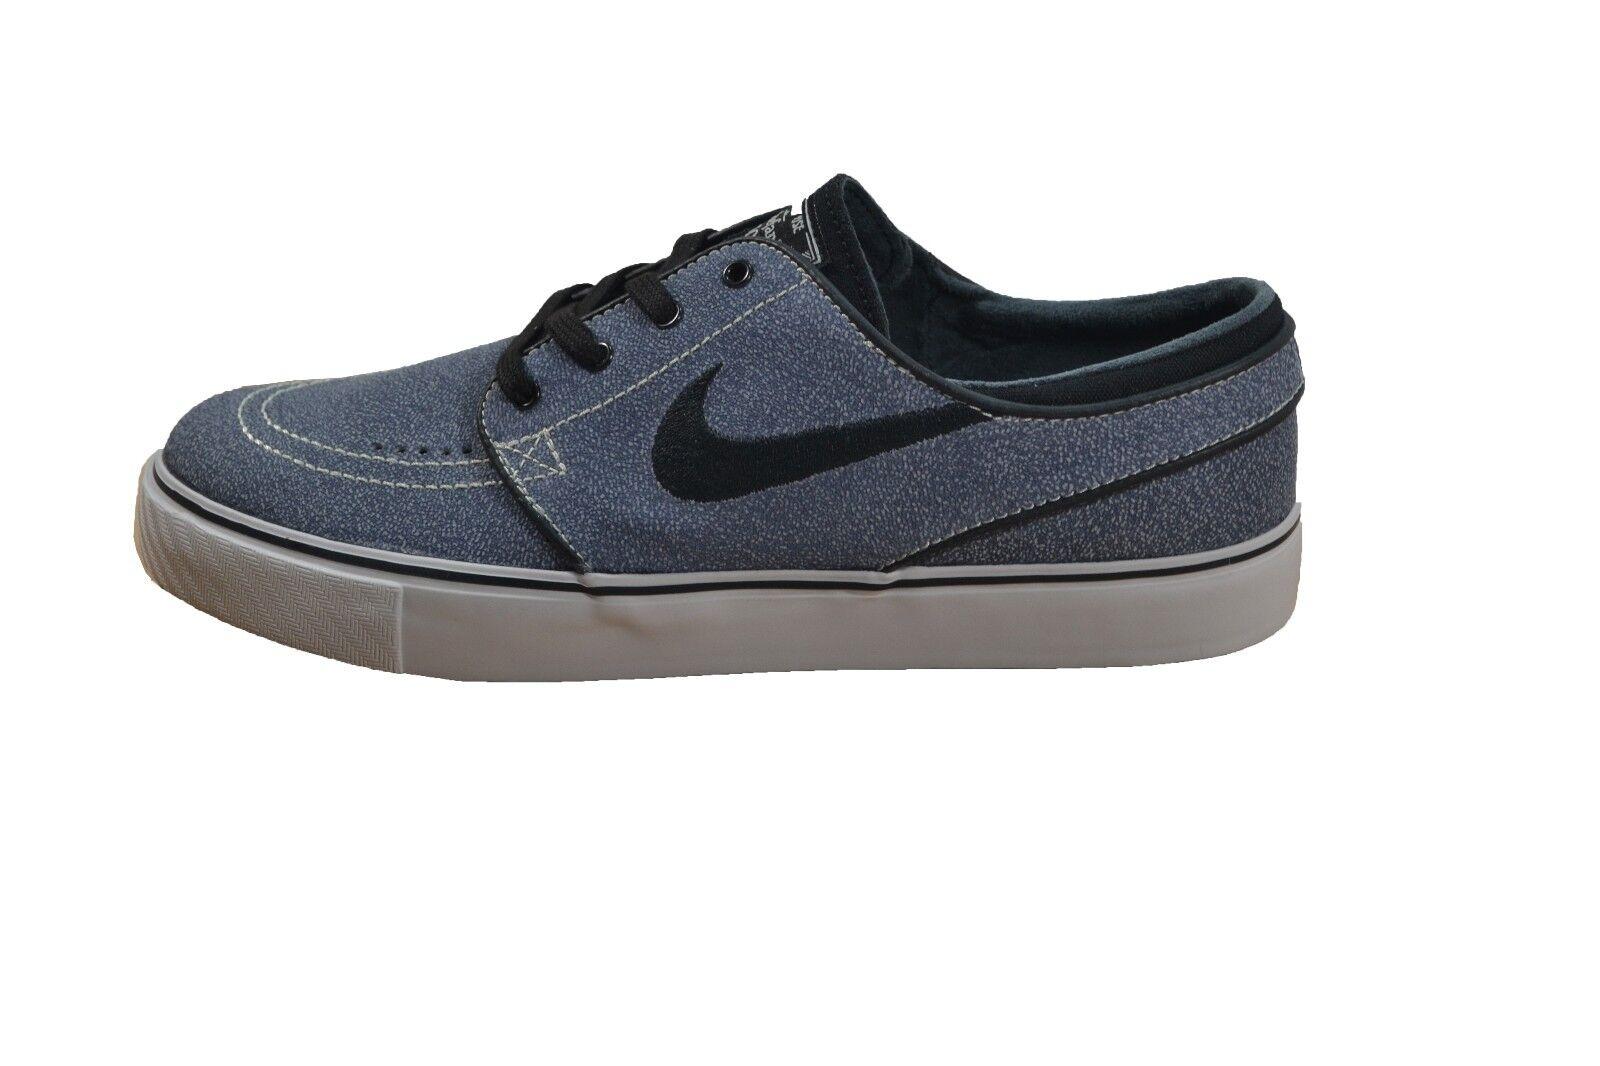 Nike Zoom Stefan gris Janoski vela luz negra gris Stefan ceniza, precio de descuento reducción zapatos de hombre acd6b9